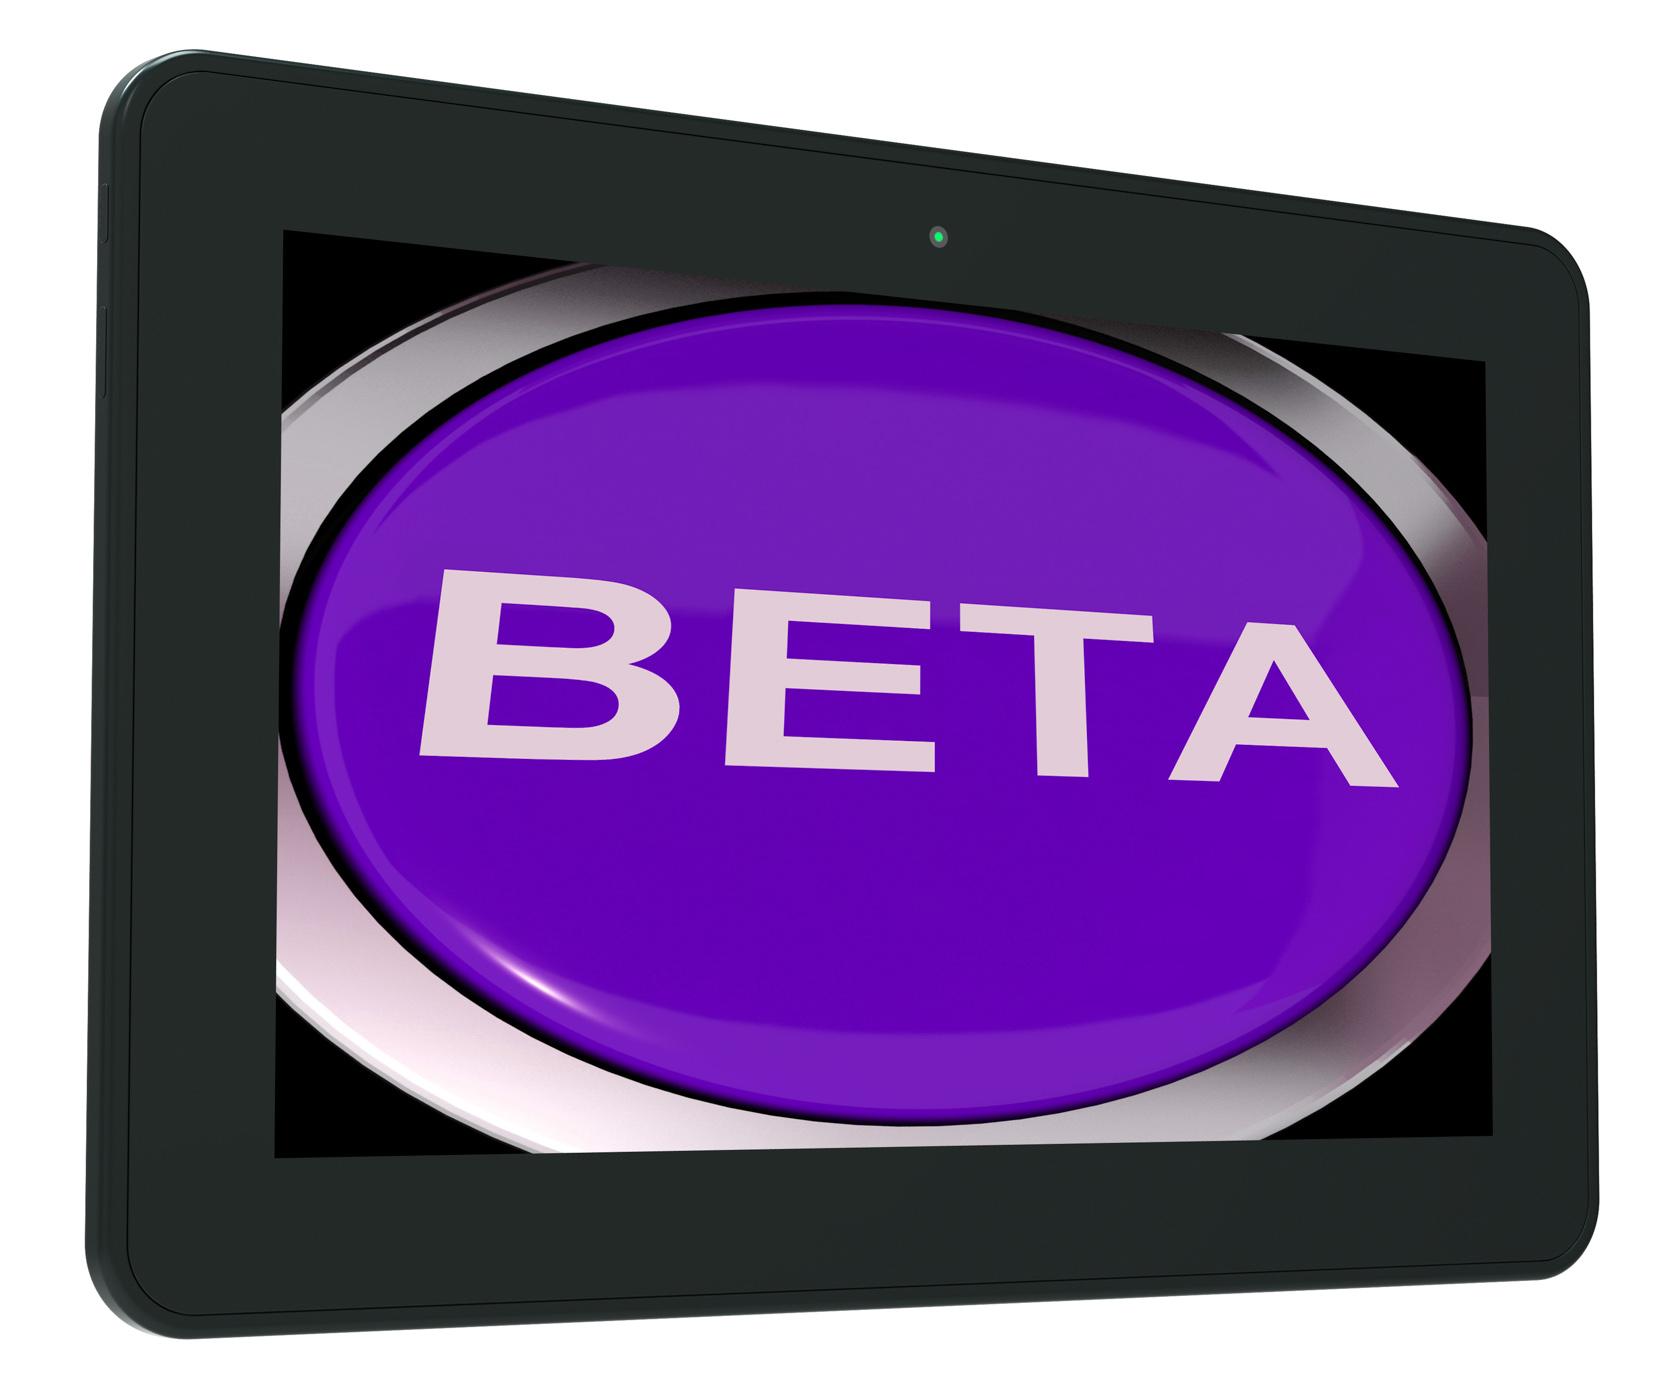 Beta Switch Shows Development Or Demo Version, Beta, Button, Demo, Development, HQ Photo